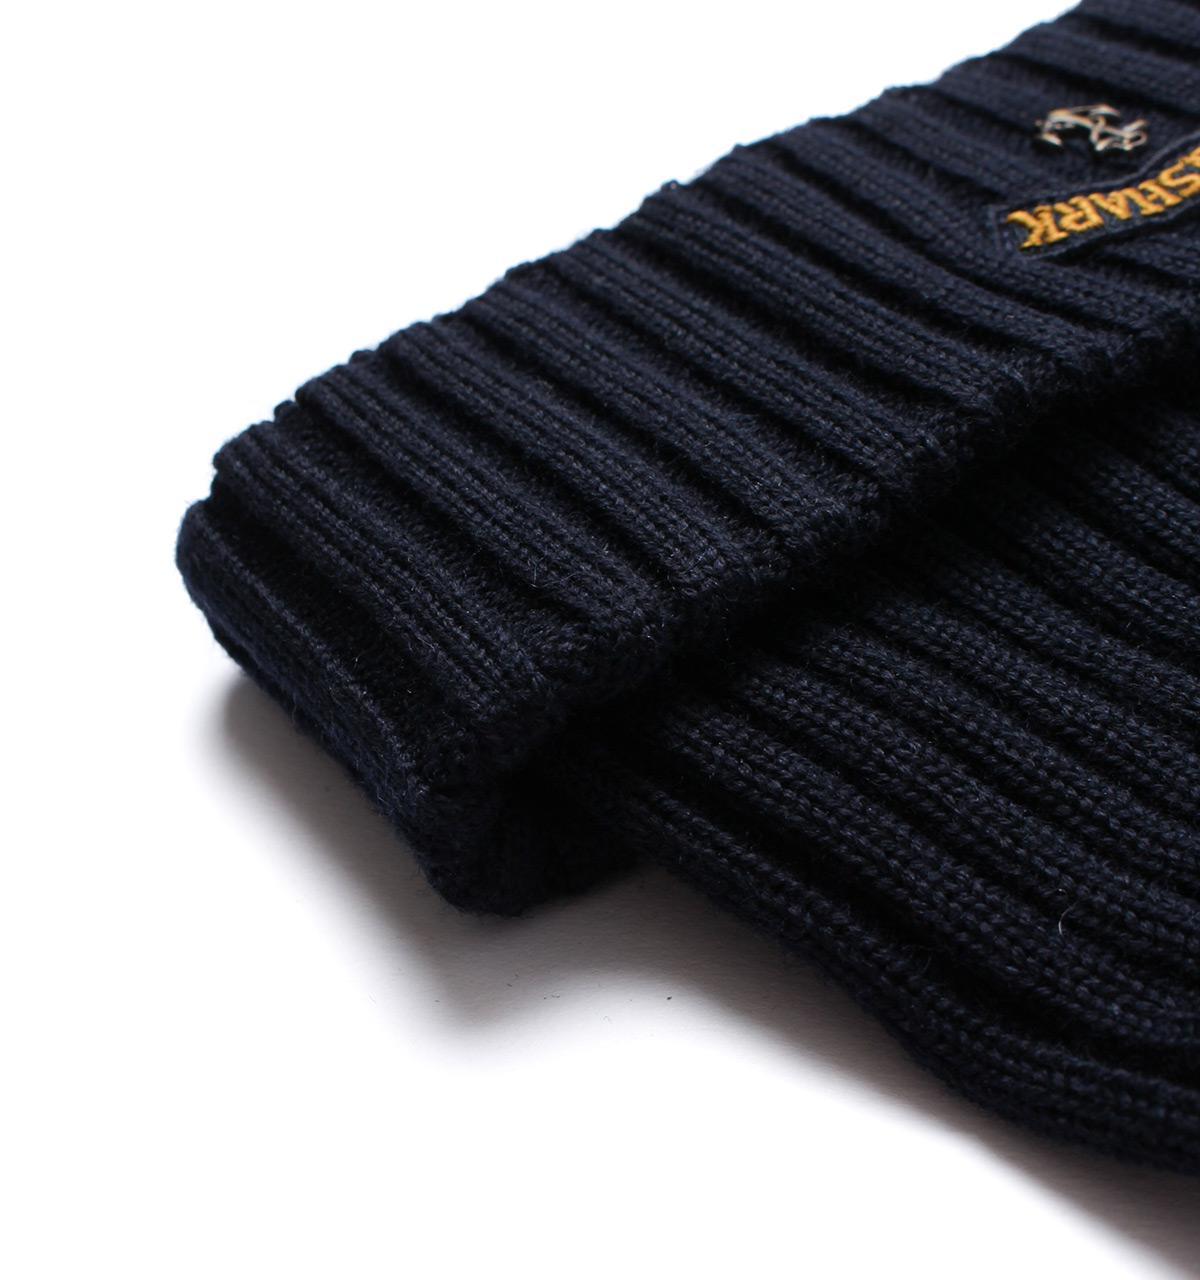 Lyst - Paul   Shark Ribbed Woollen Navy Anchor Hat in Blue for Men d24ee0a60649